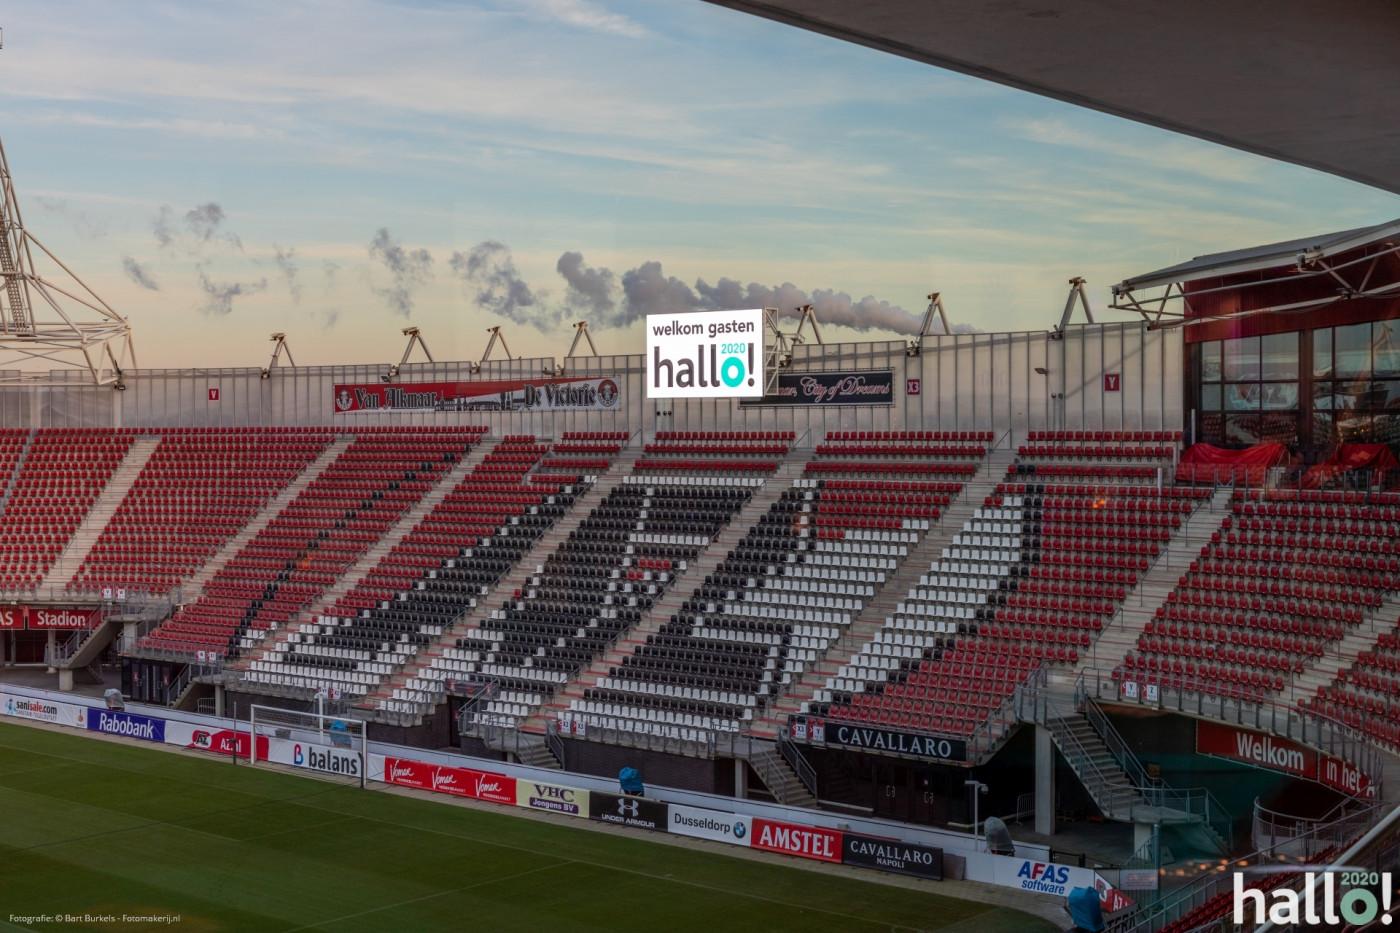 Hallo 2020 signing ledscherm stadion